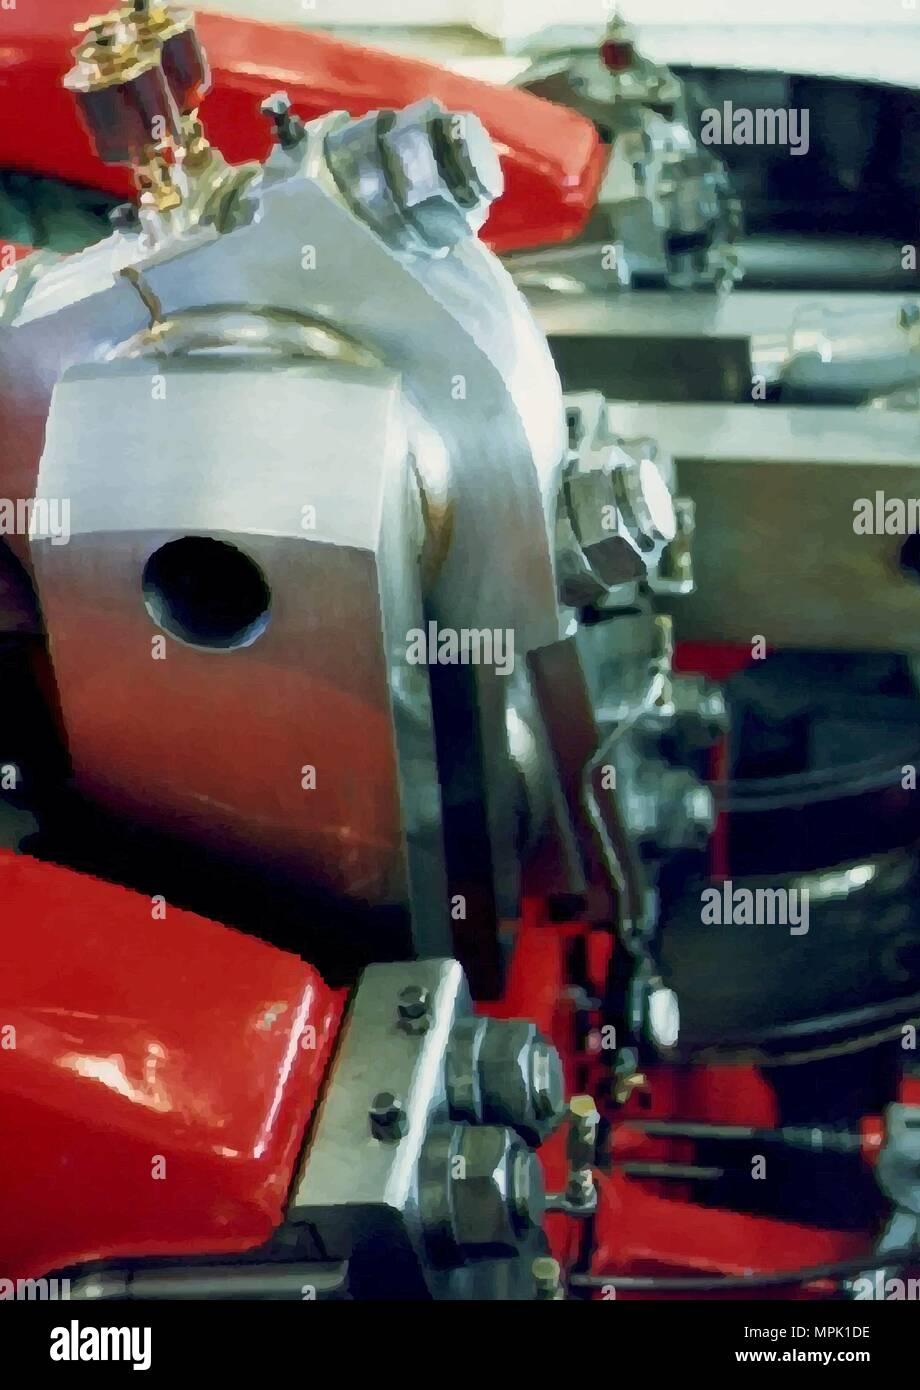 Steam Engine Crankshaft - Stock Image